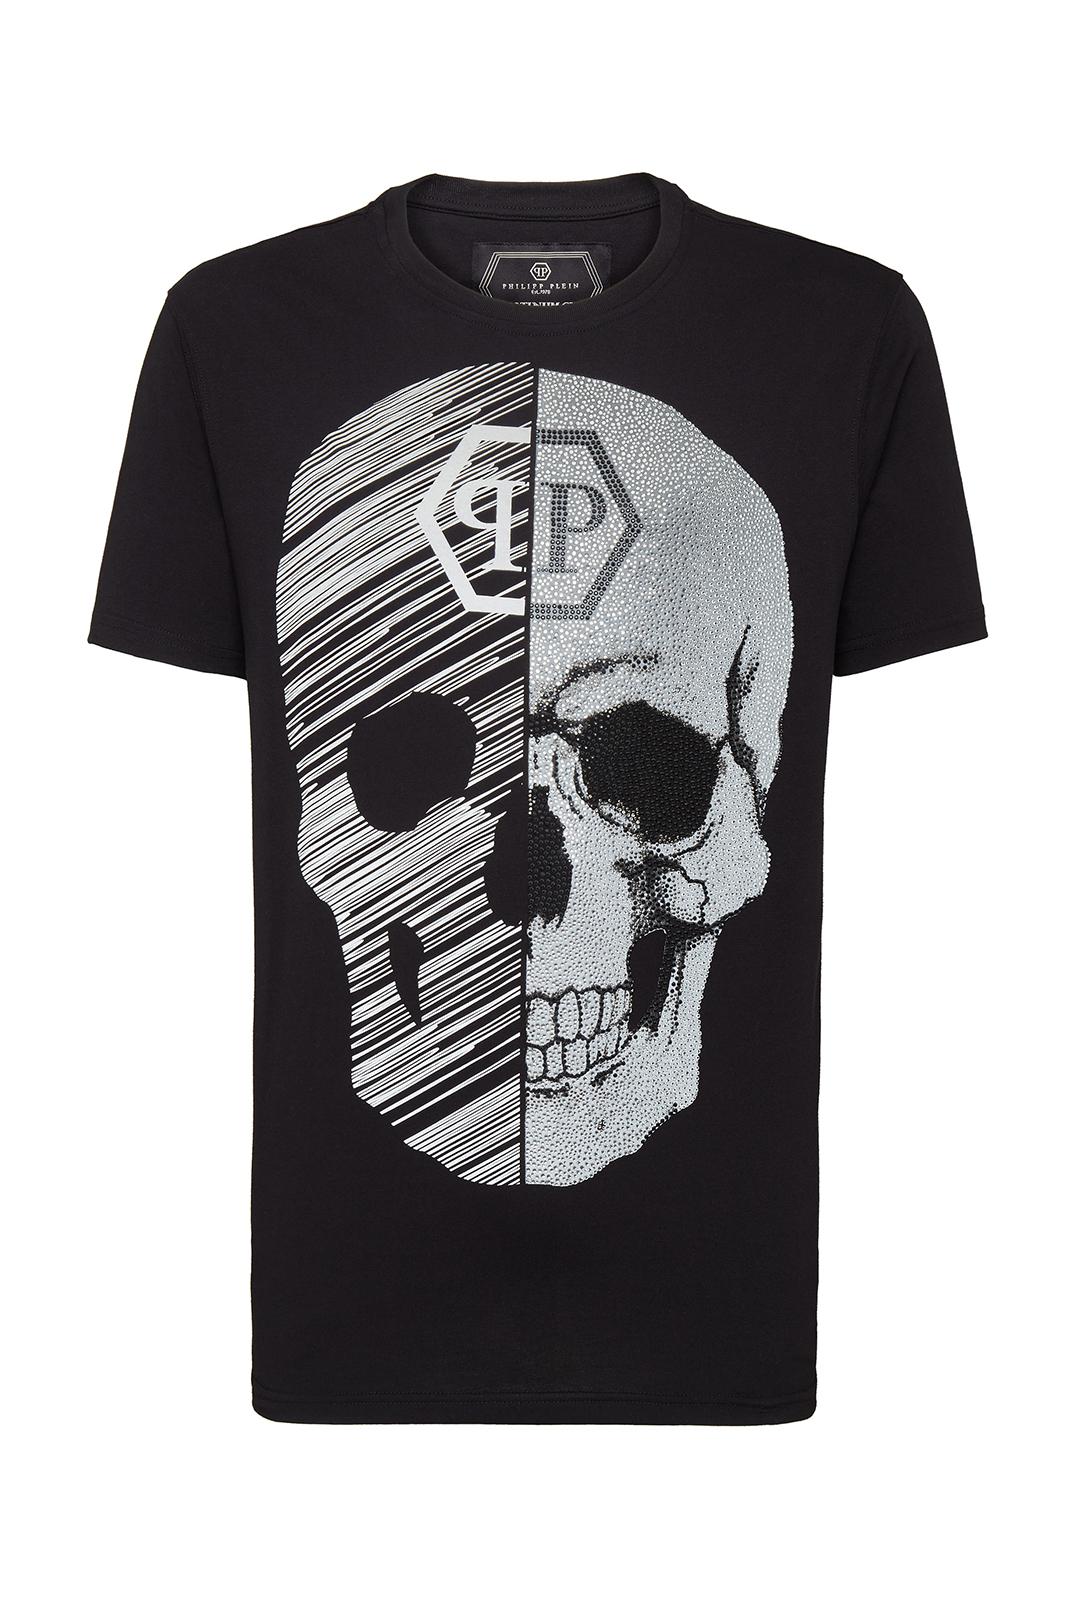 Tee-shirts  Philipp plein MTK3336 NECK SKULL 02 BLACK